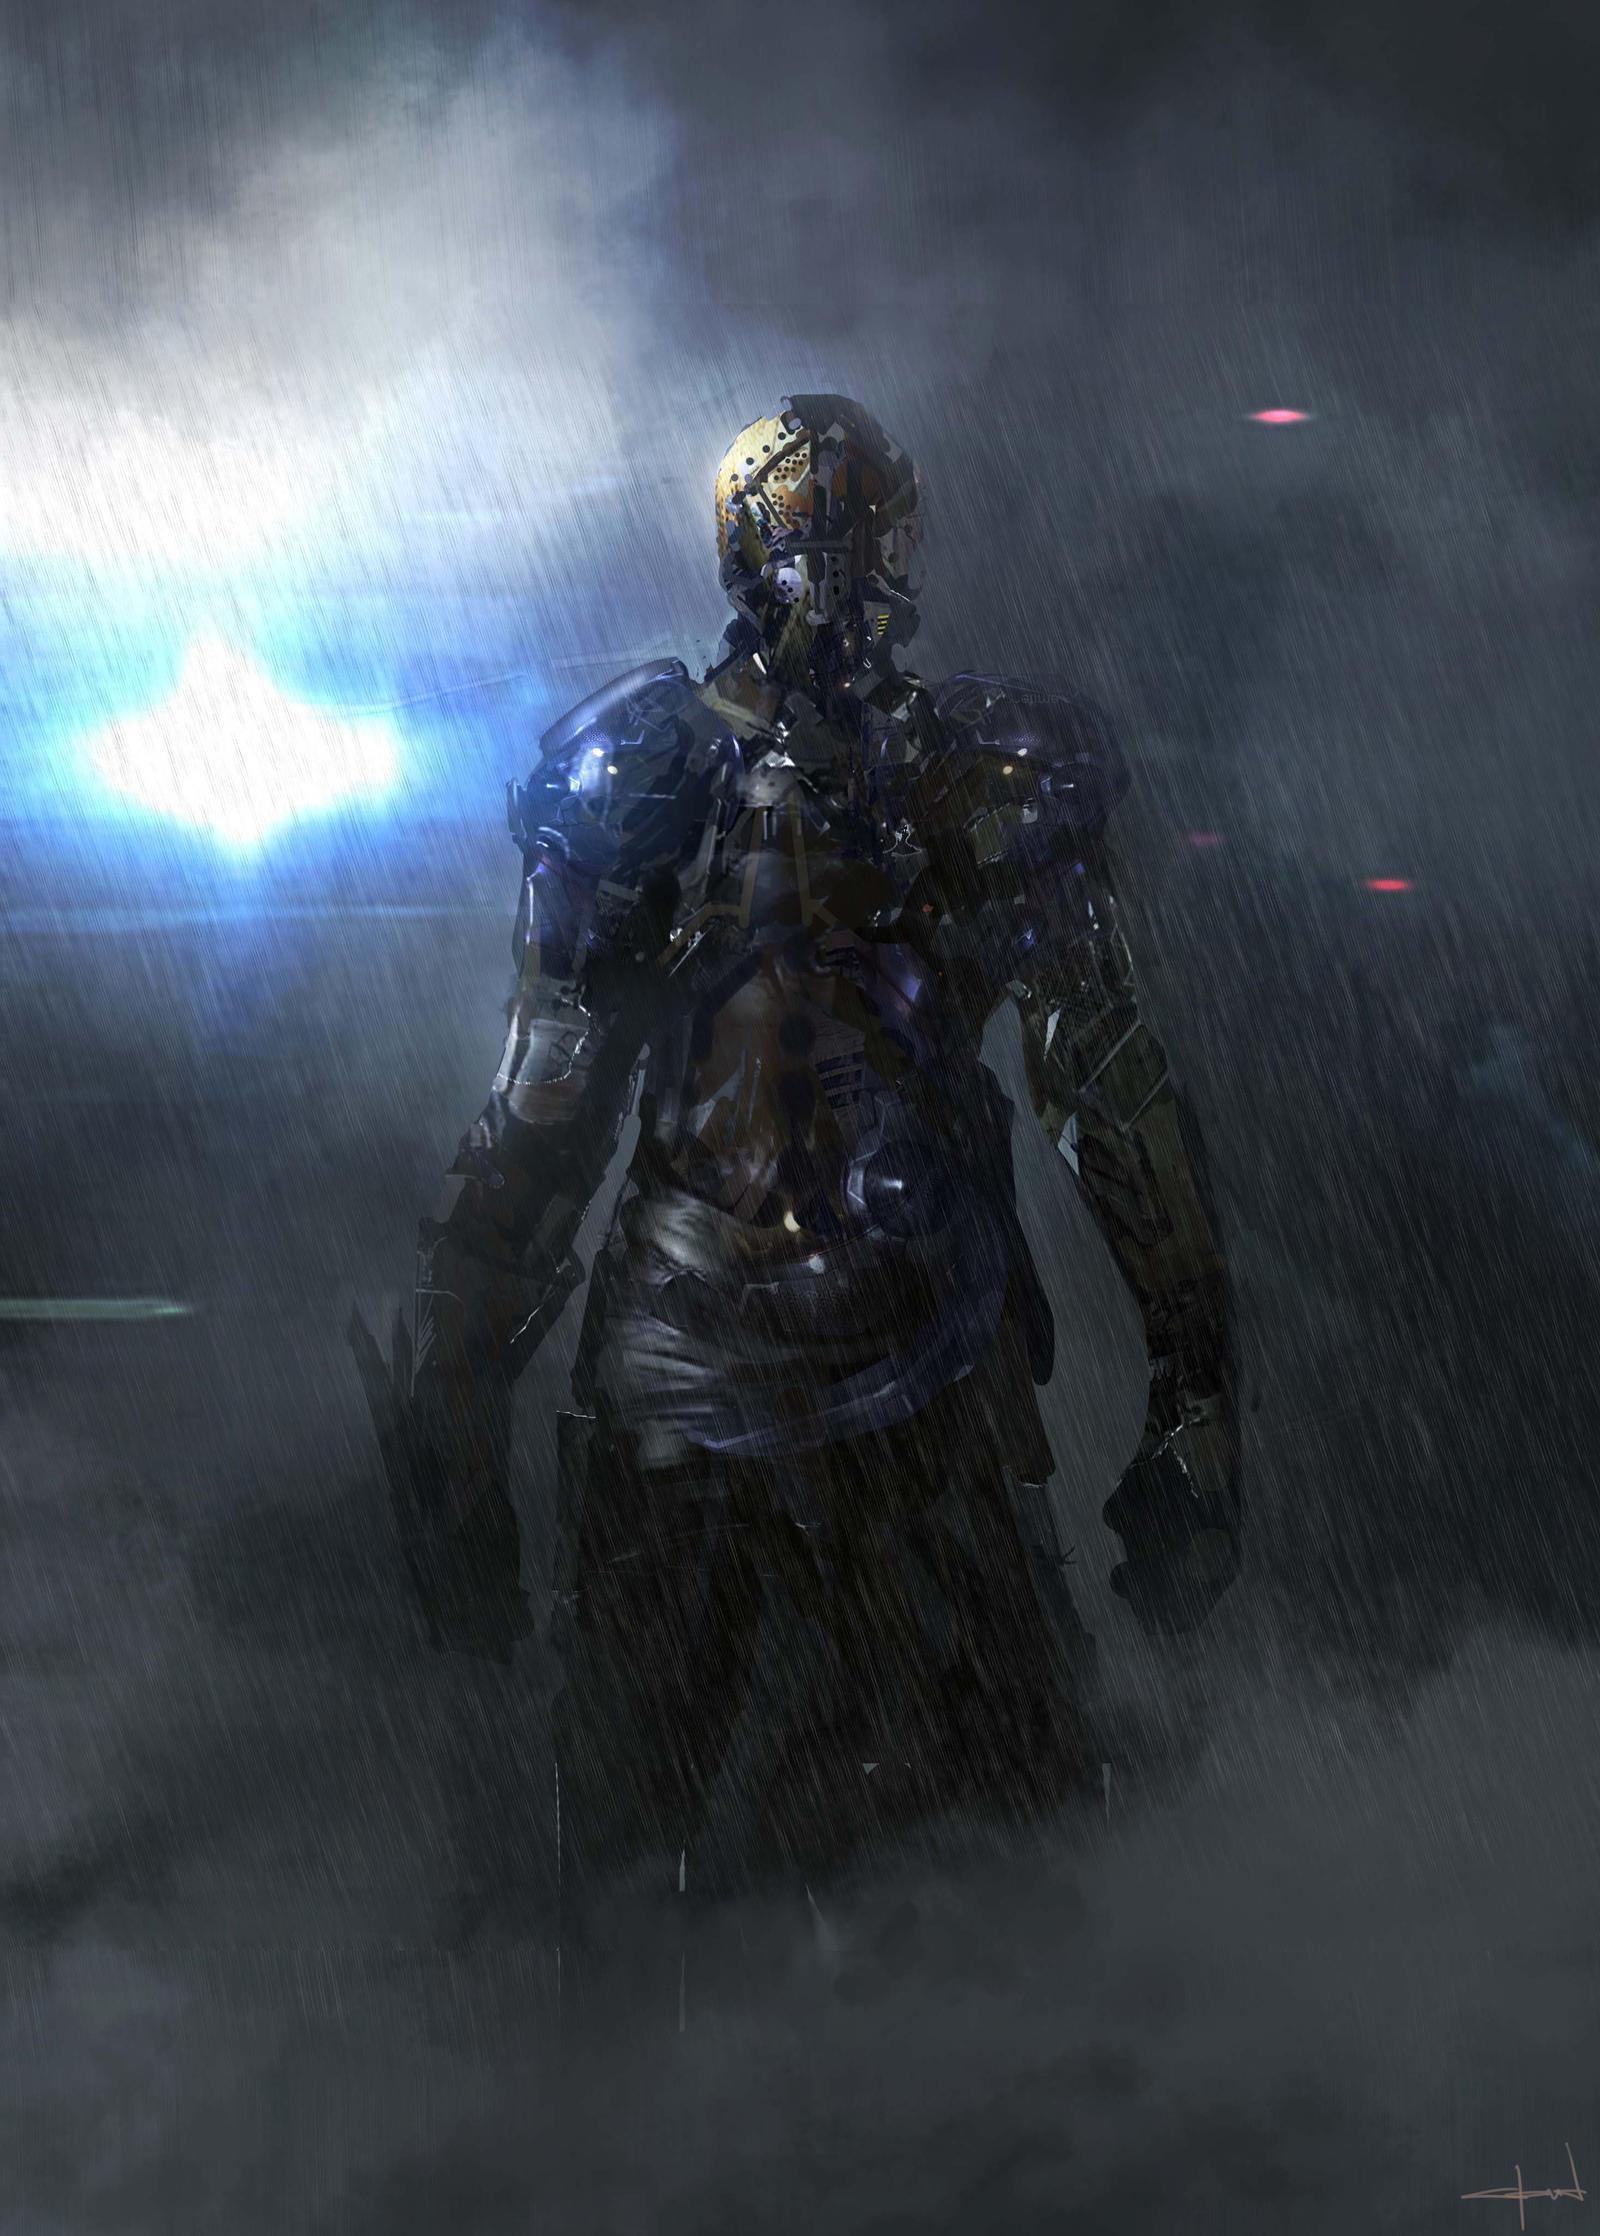 Junk character study post by Darkcloud013